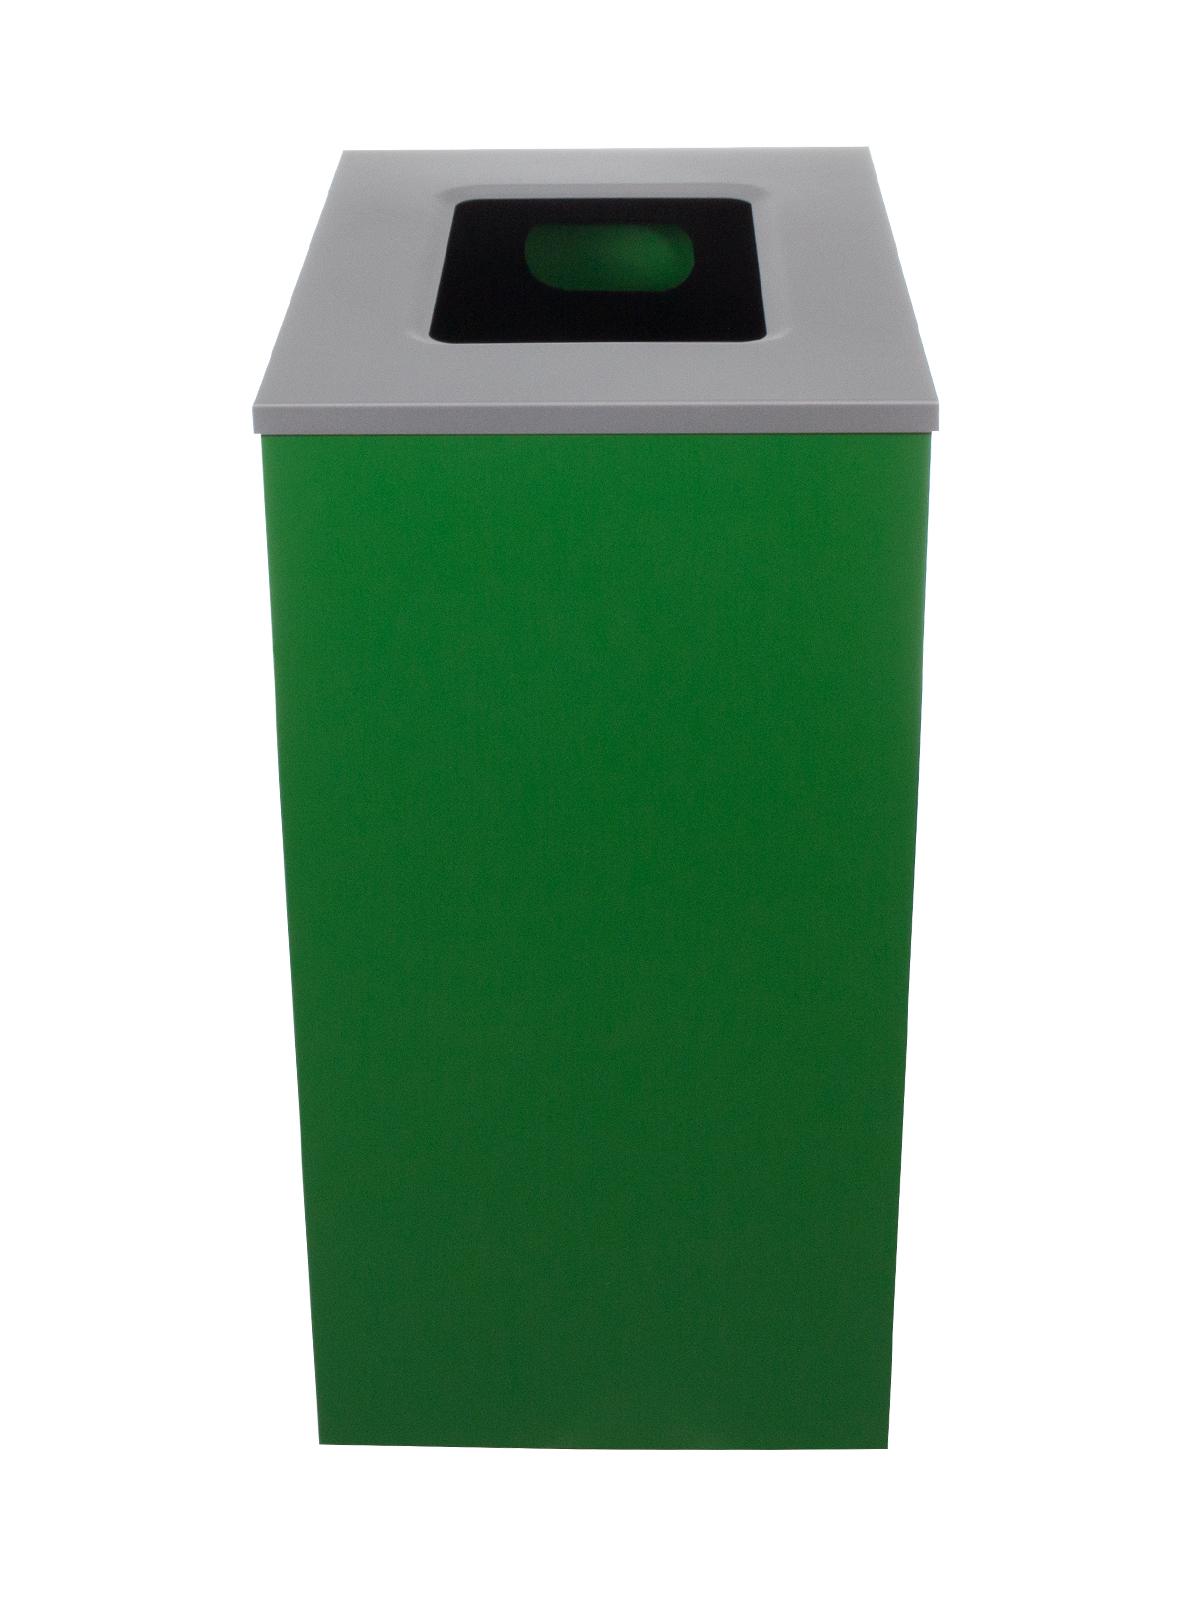 SPECTRUM - Single - Cube Xl - Organics - Full - Dark Green